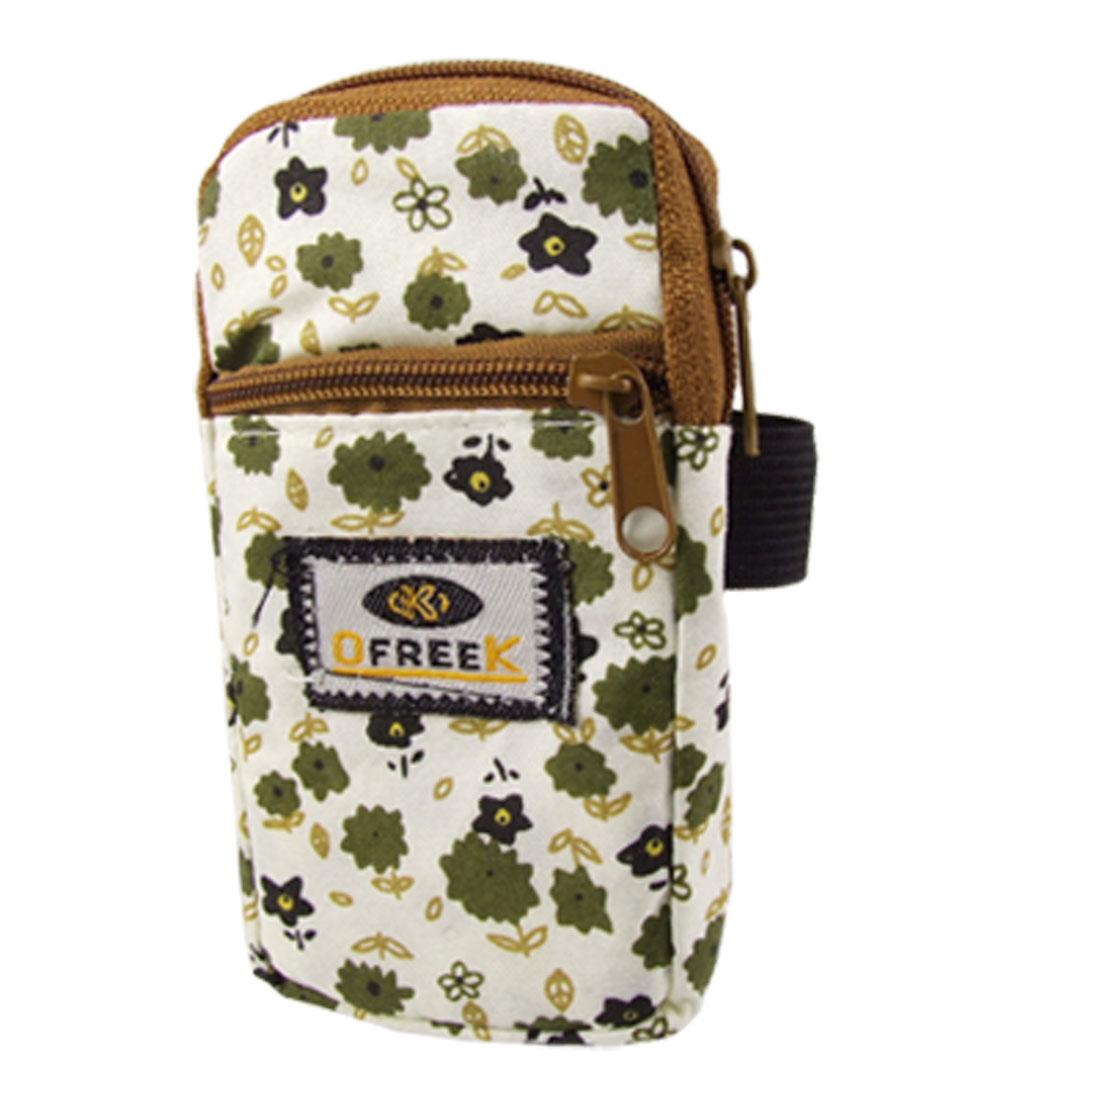 Phone MP3 Olive Green Flower Print Fabric Zipper Wrist Pouch Bag